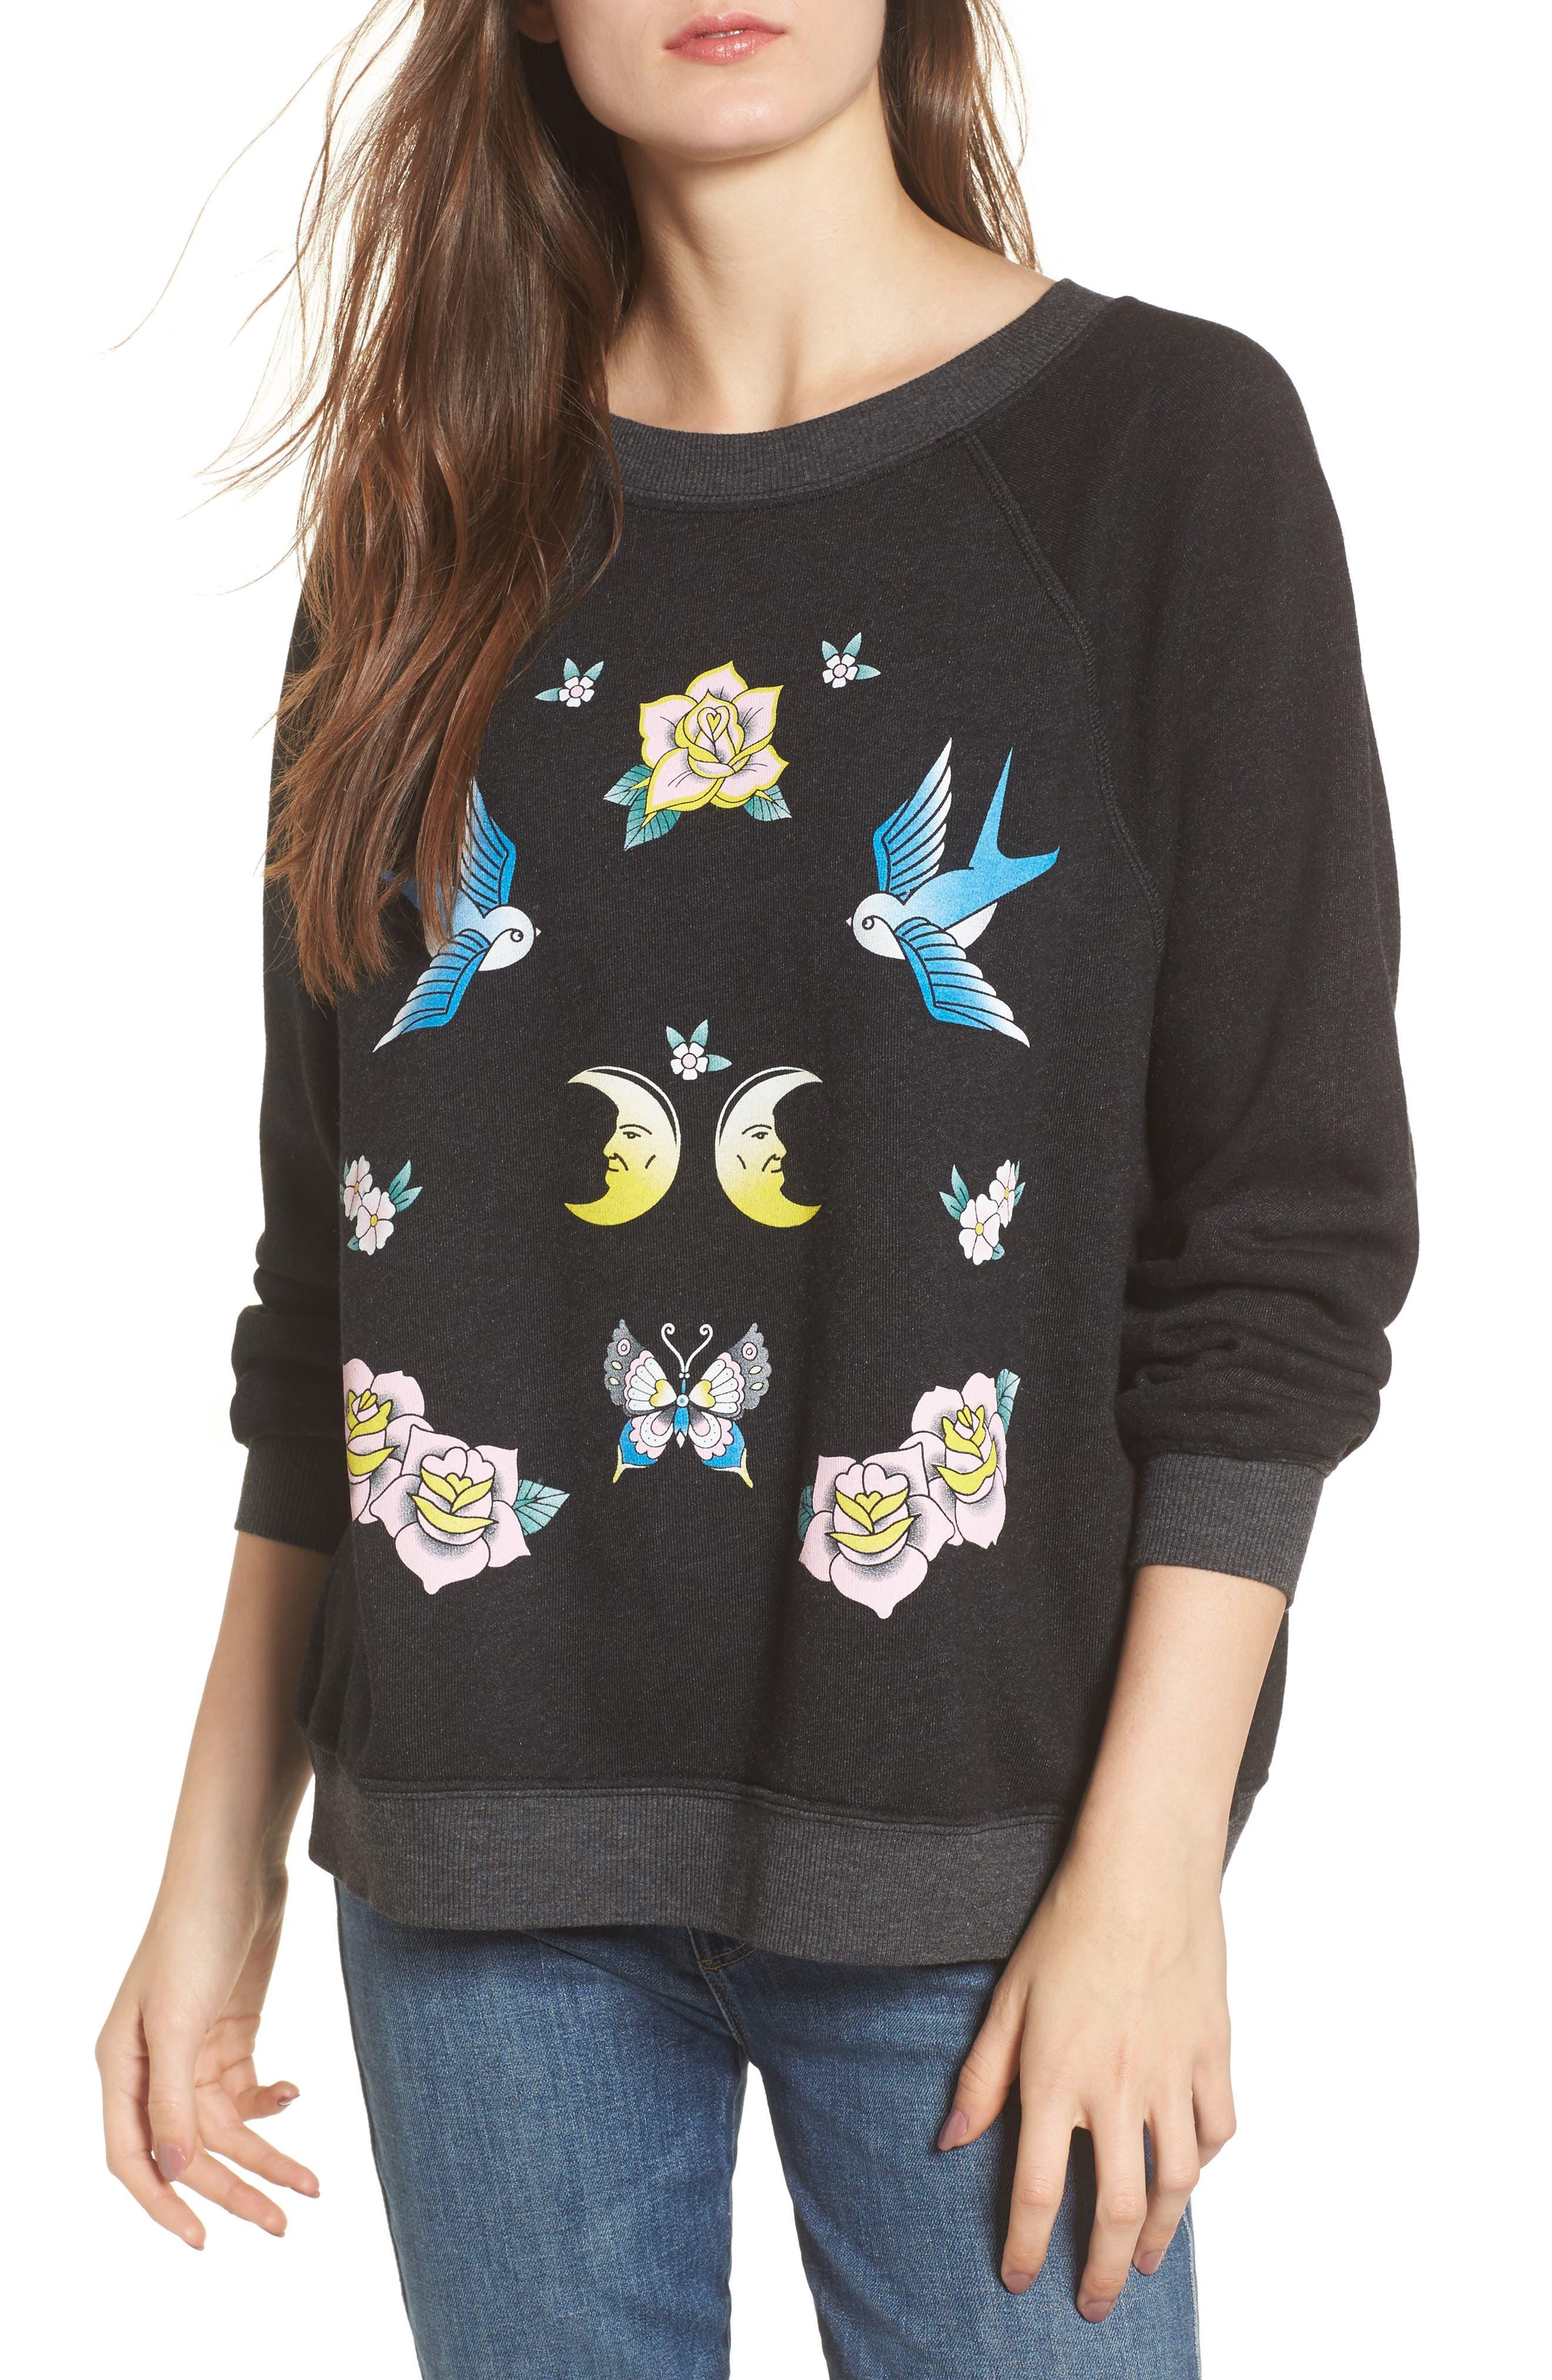 Flash Sweatshirt,                         Main,                         color, Black